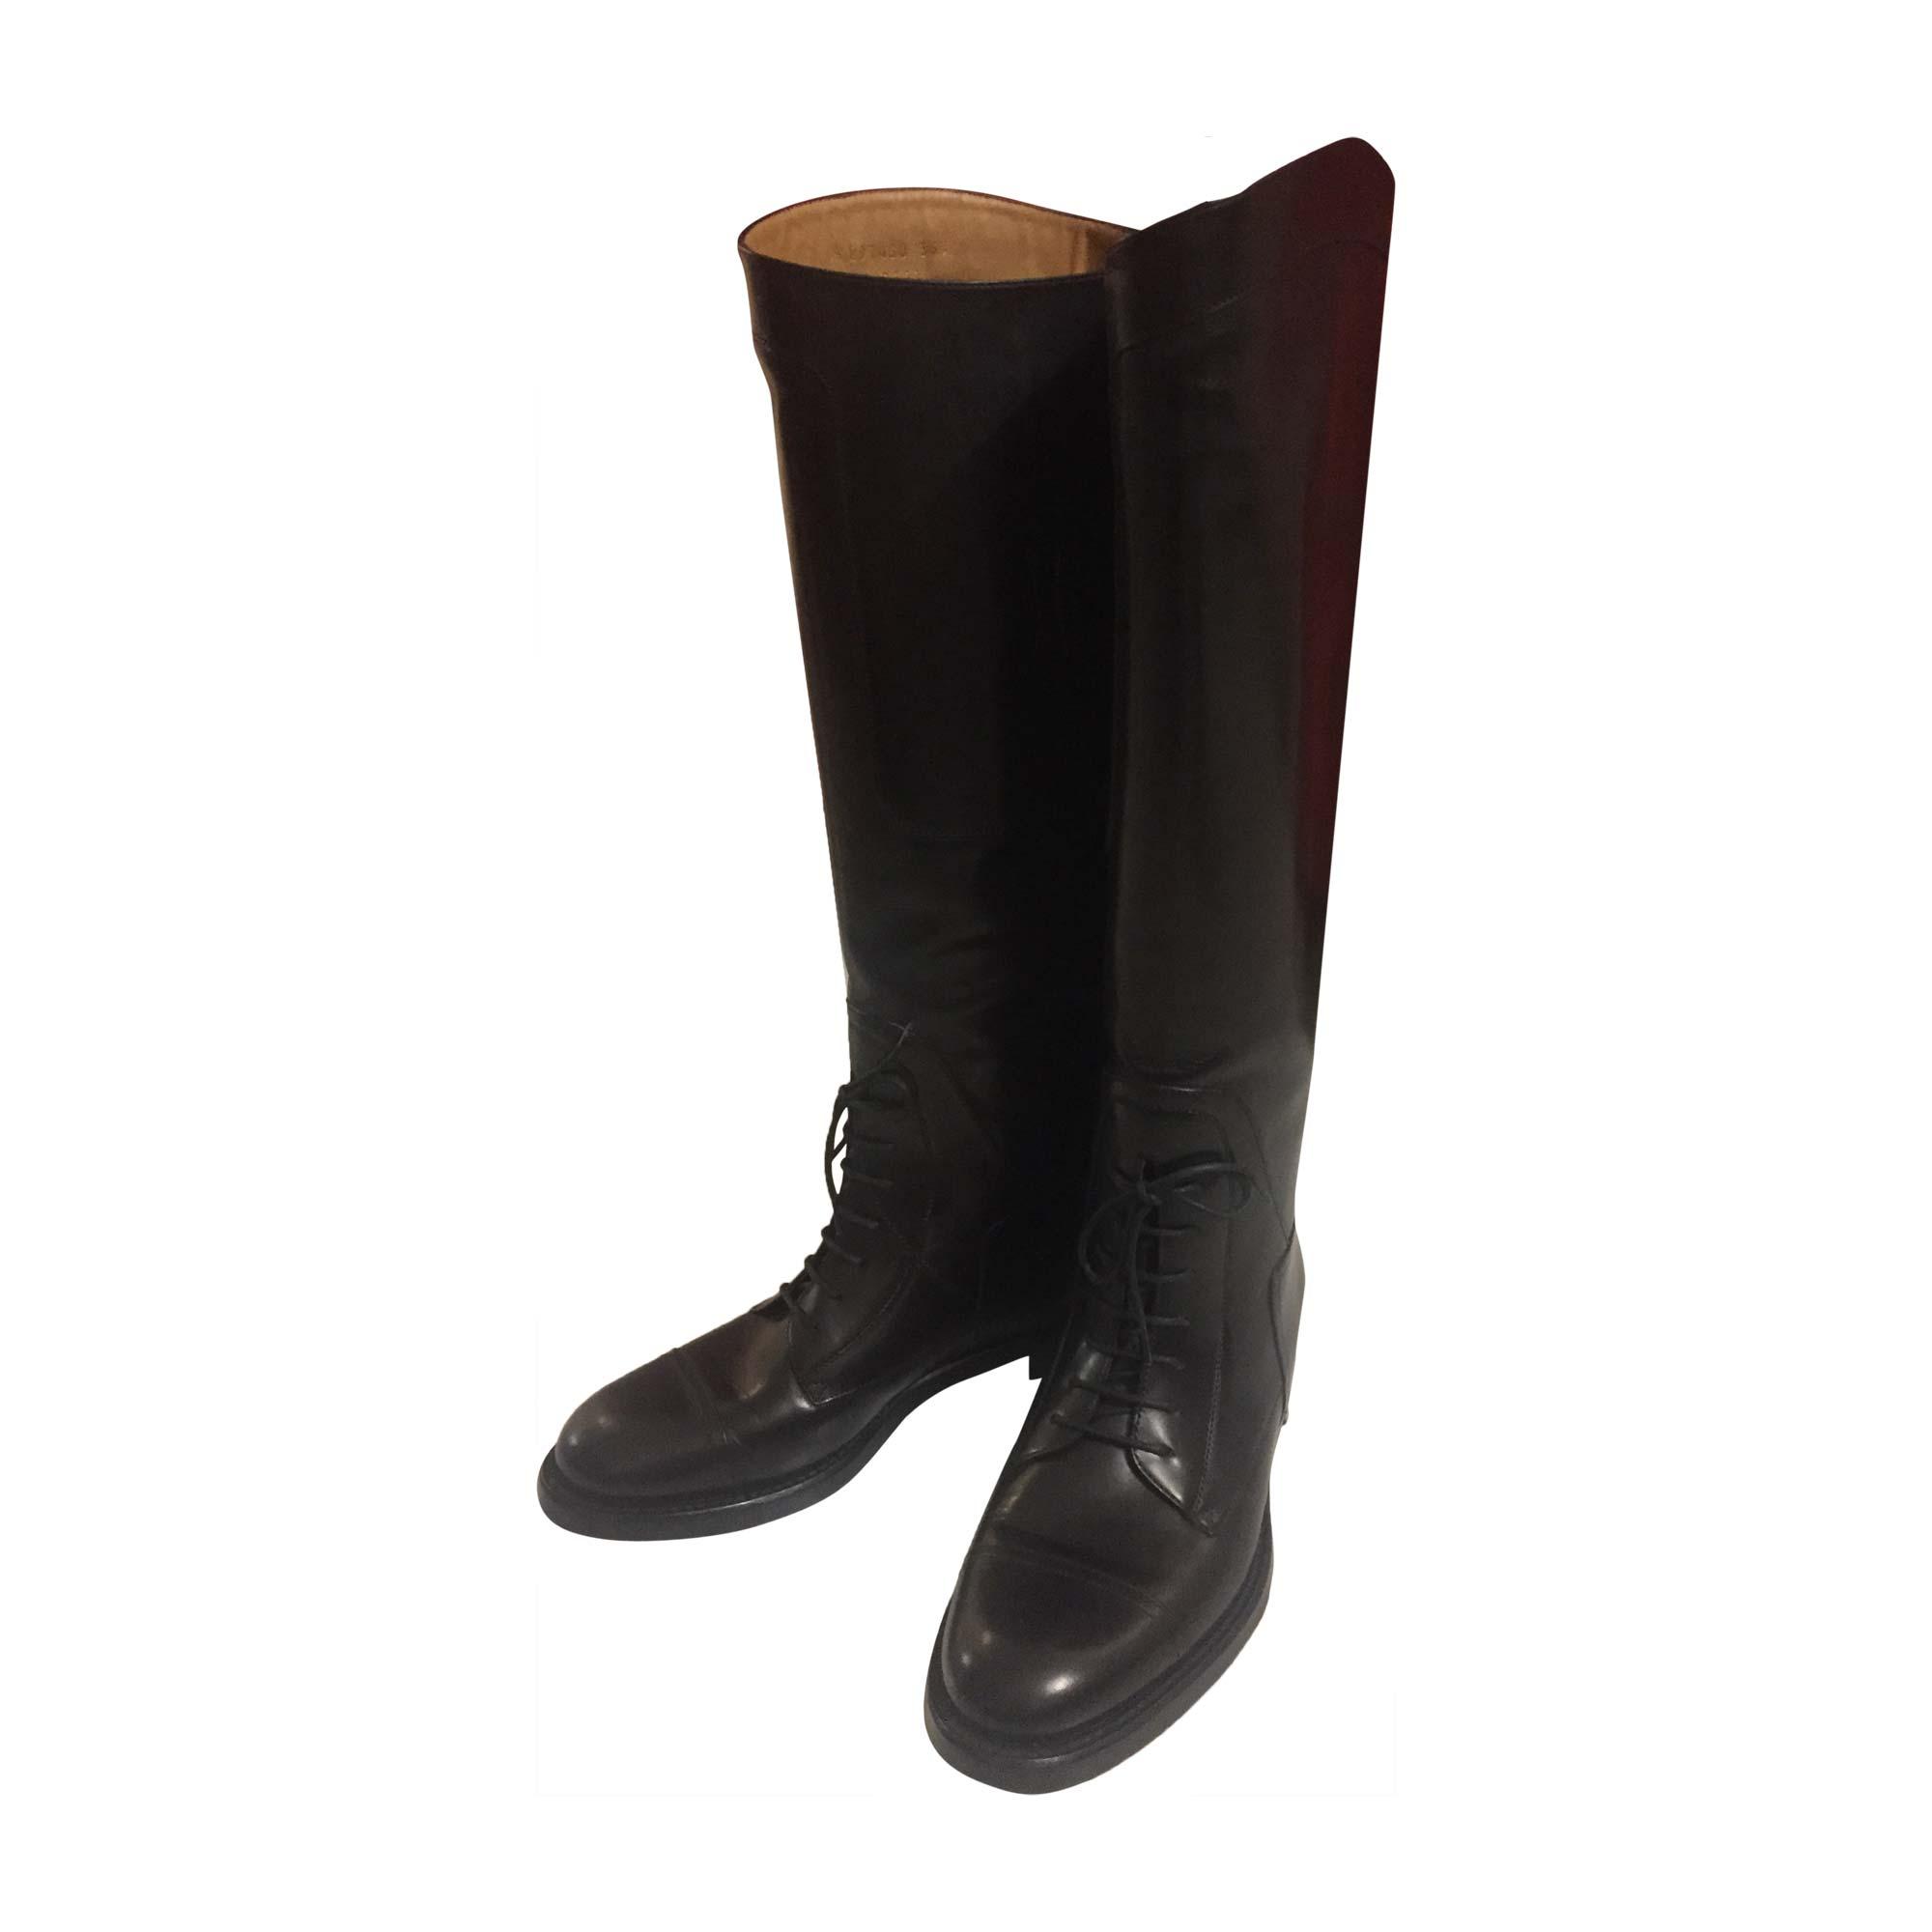 Bottes cavalières GUCCI 36,5 noir - 7206822 be4840a22ca